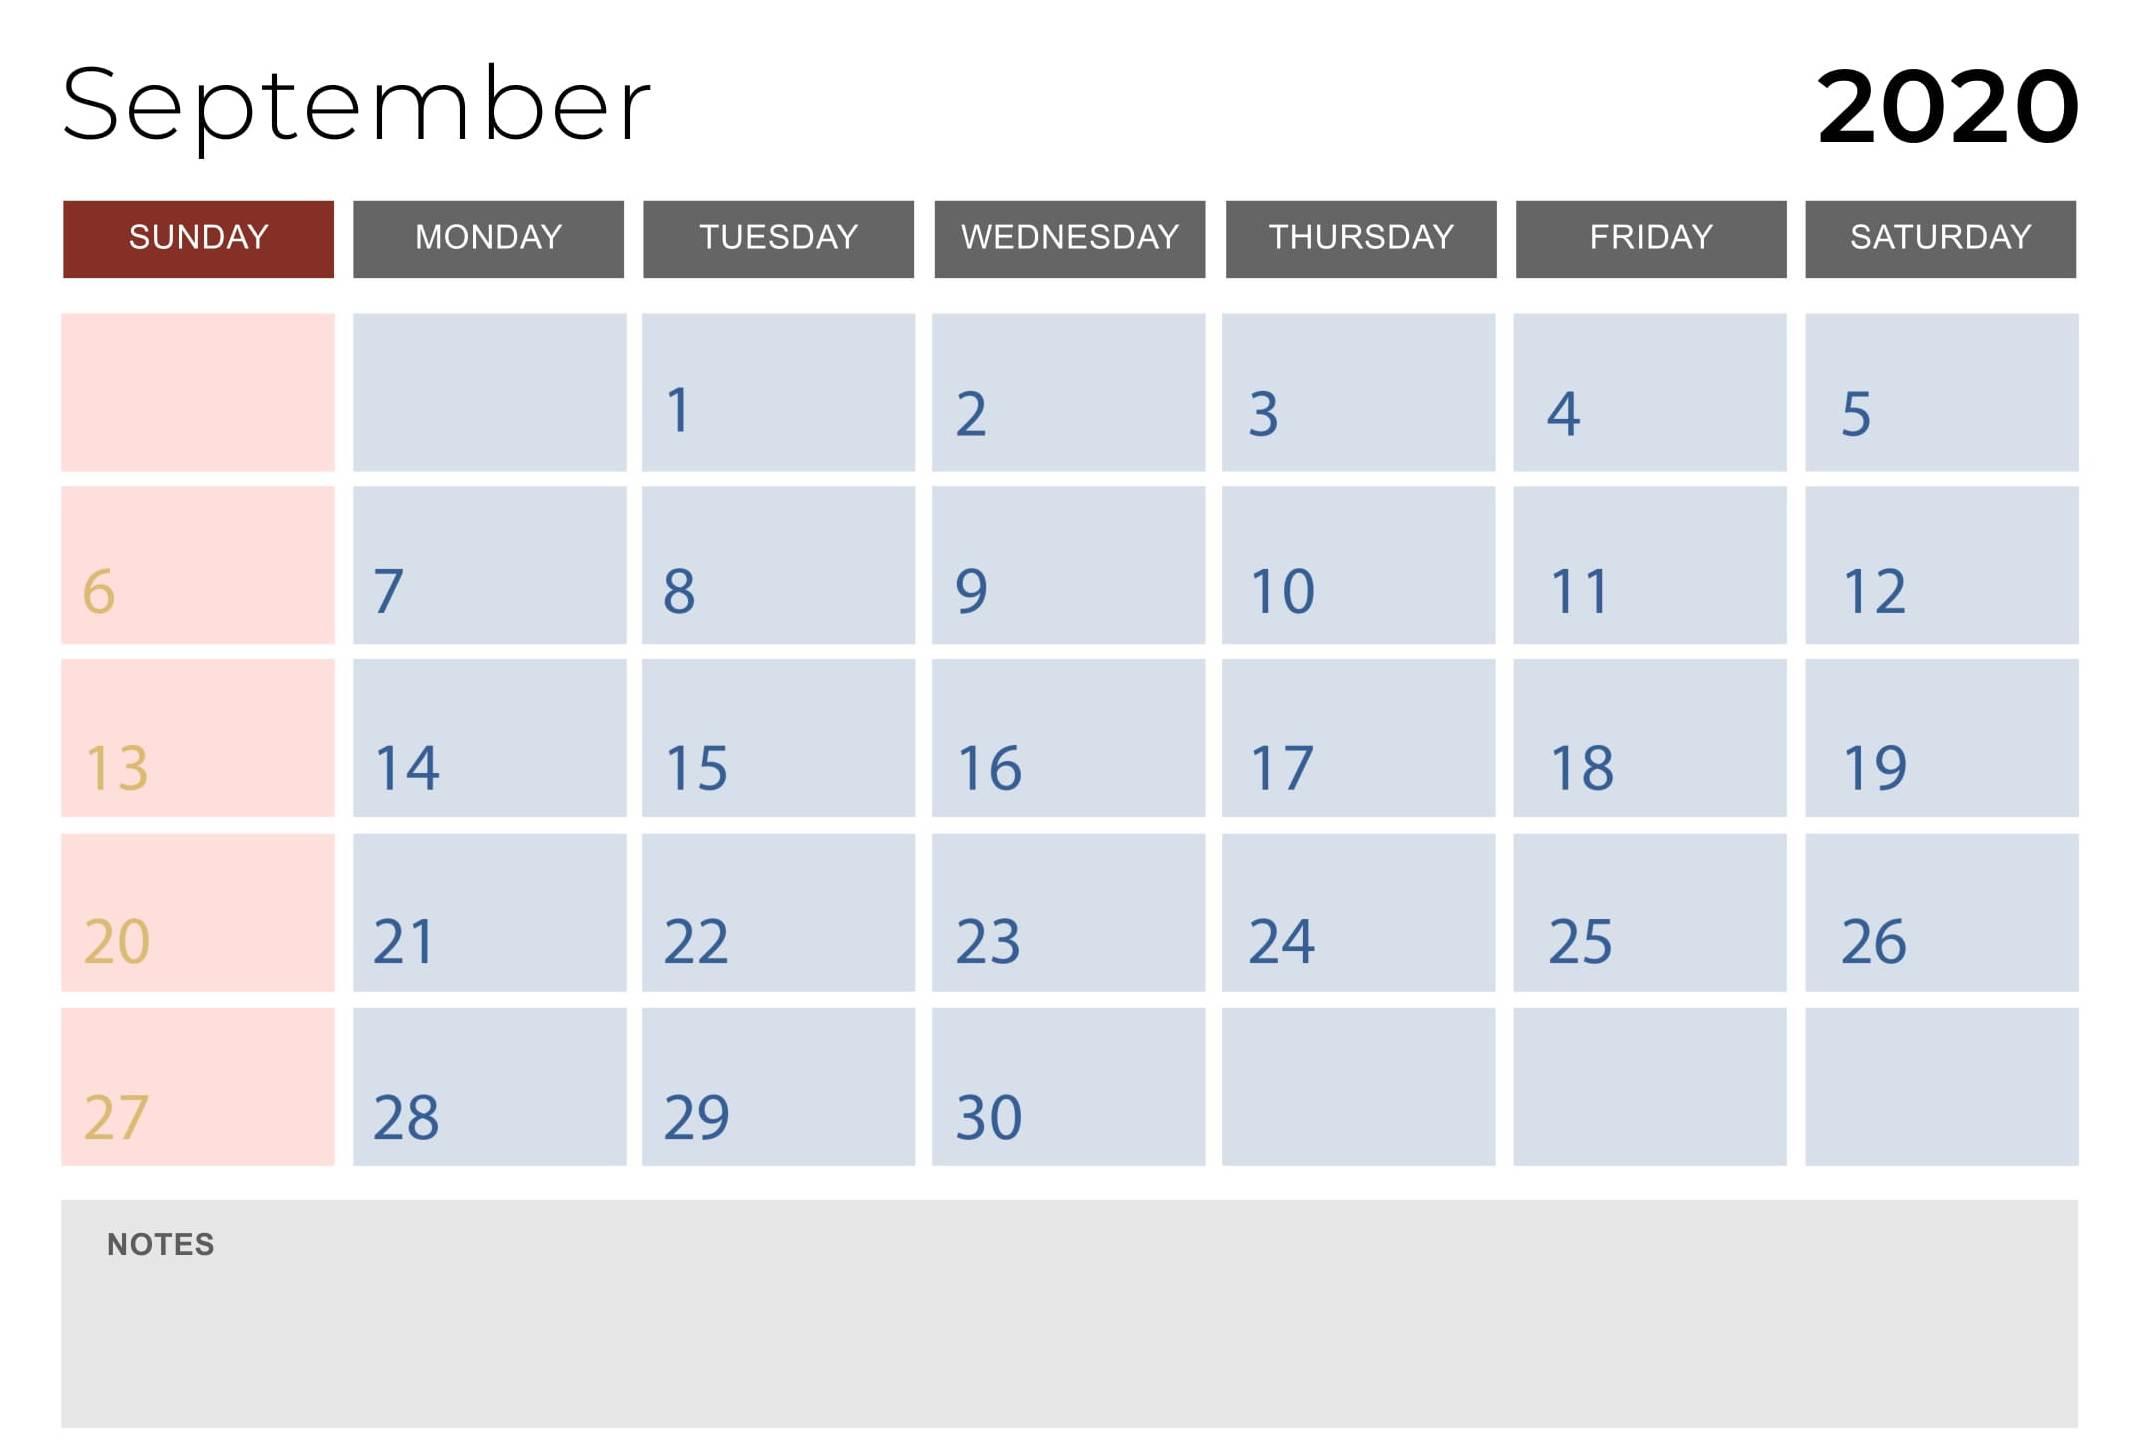 September 2020 Calendar Design